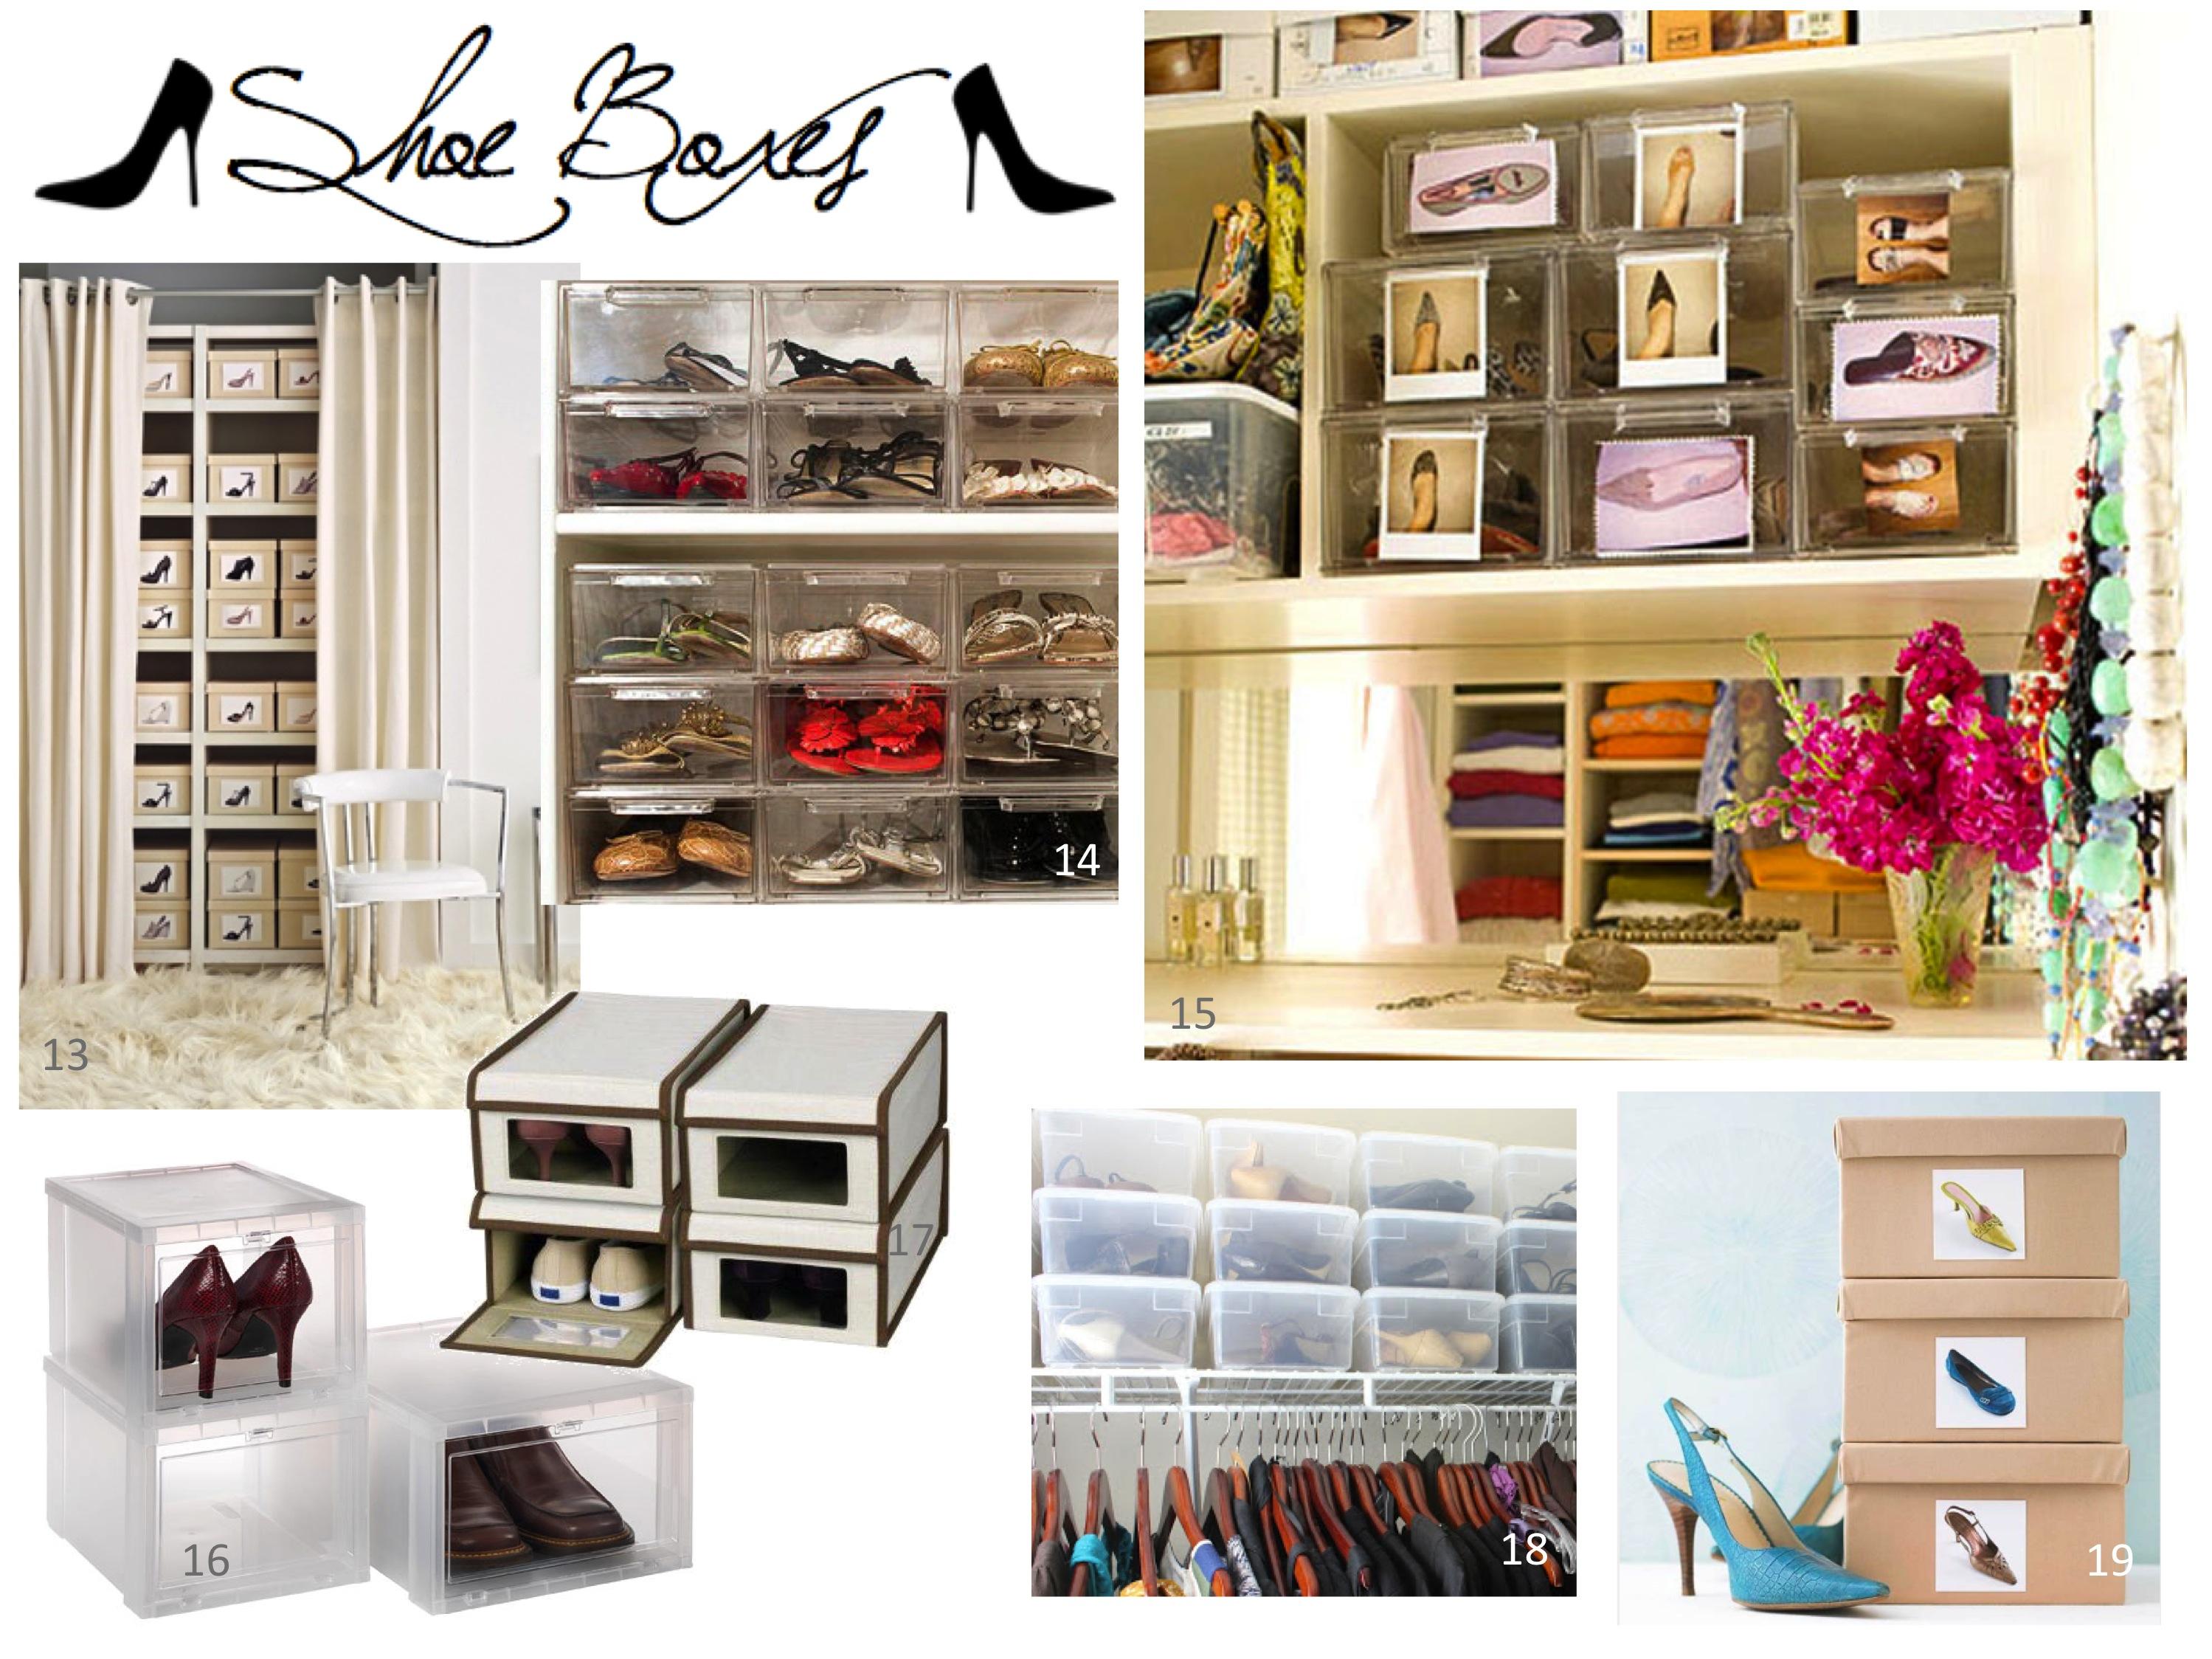 fast inexpensive garage storage ideas - 35 Shoe Organization Ideas I De clutter